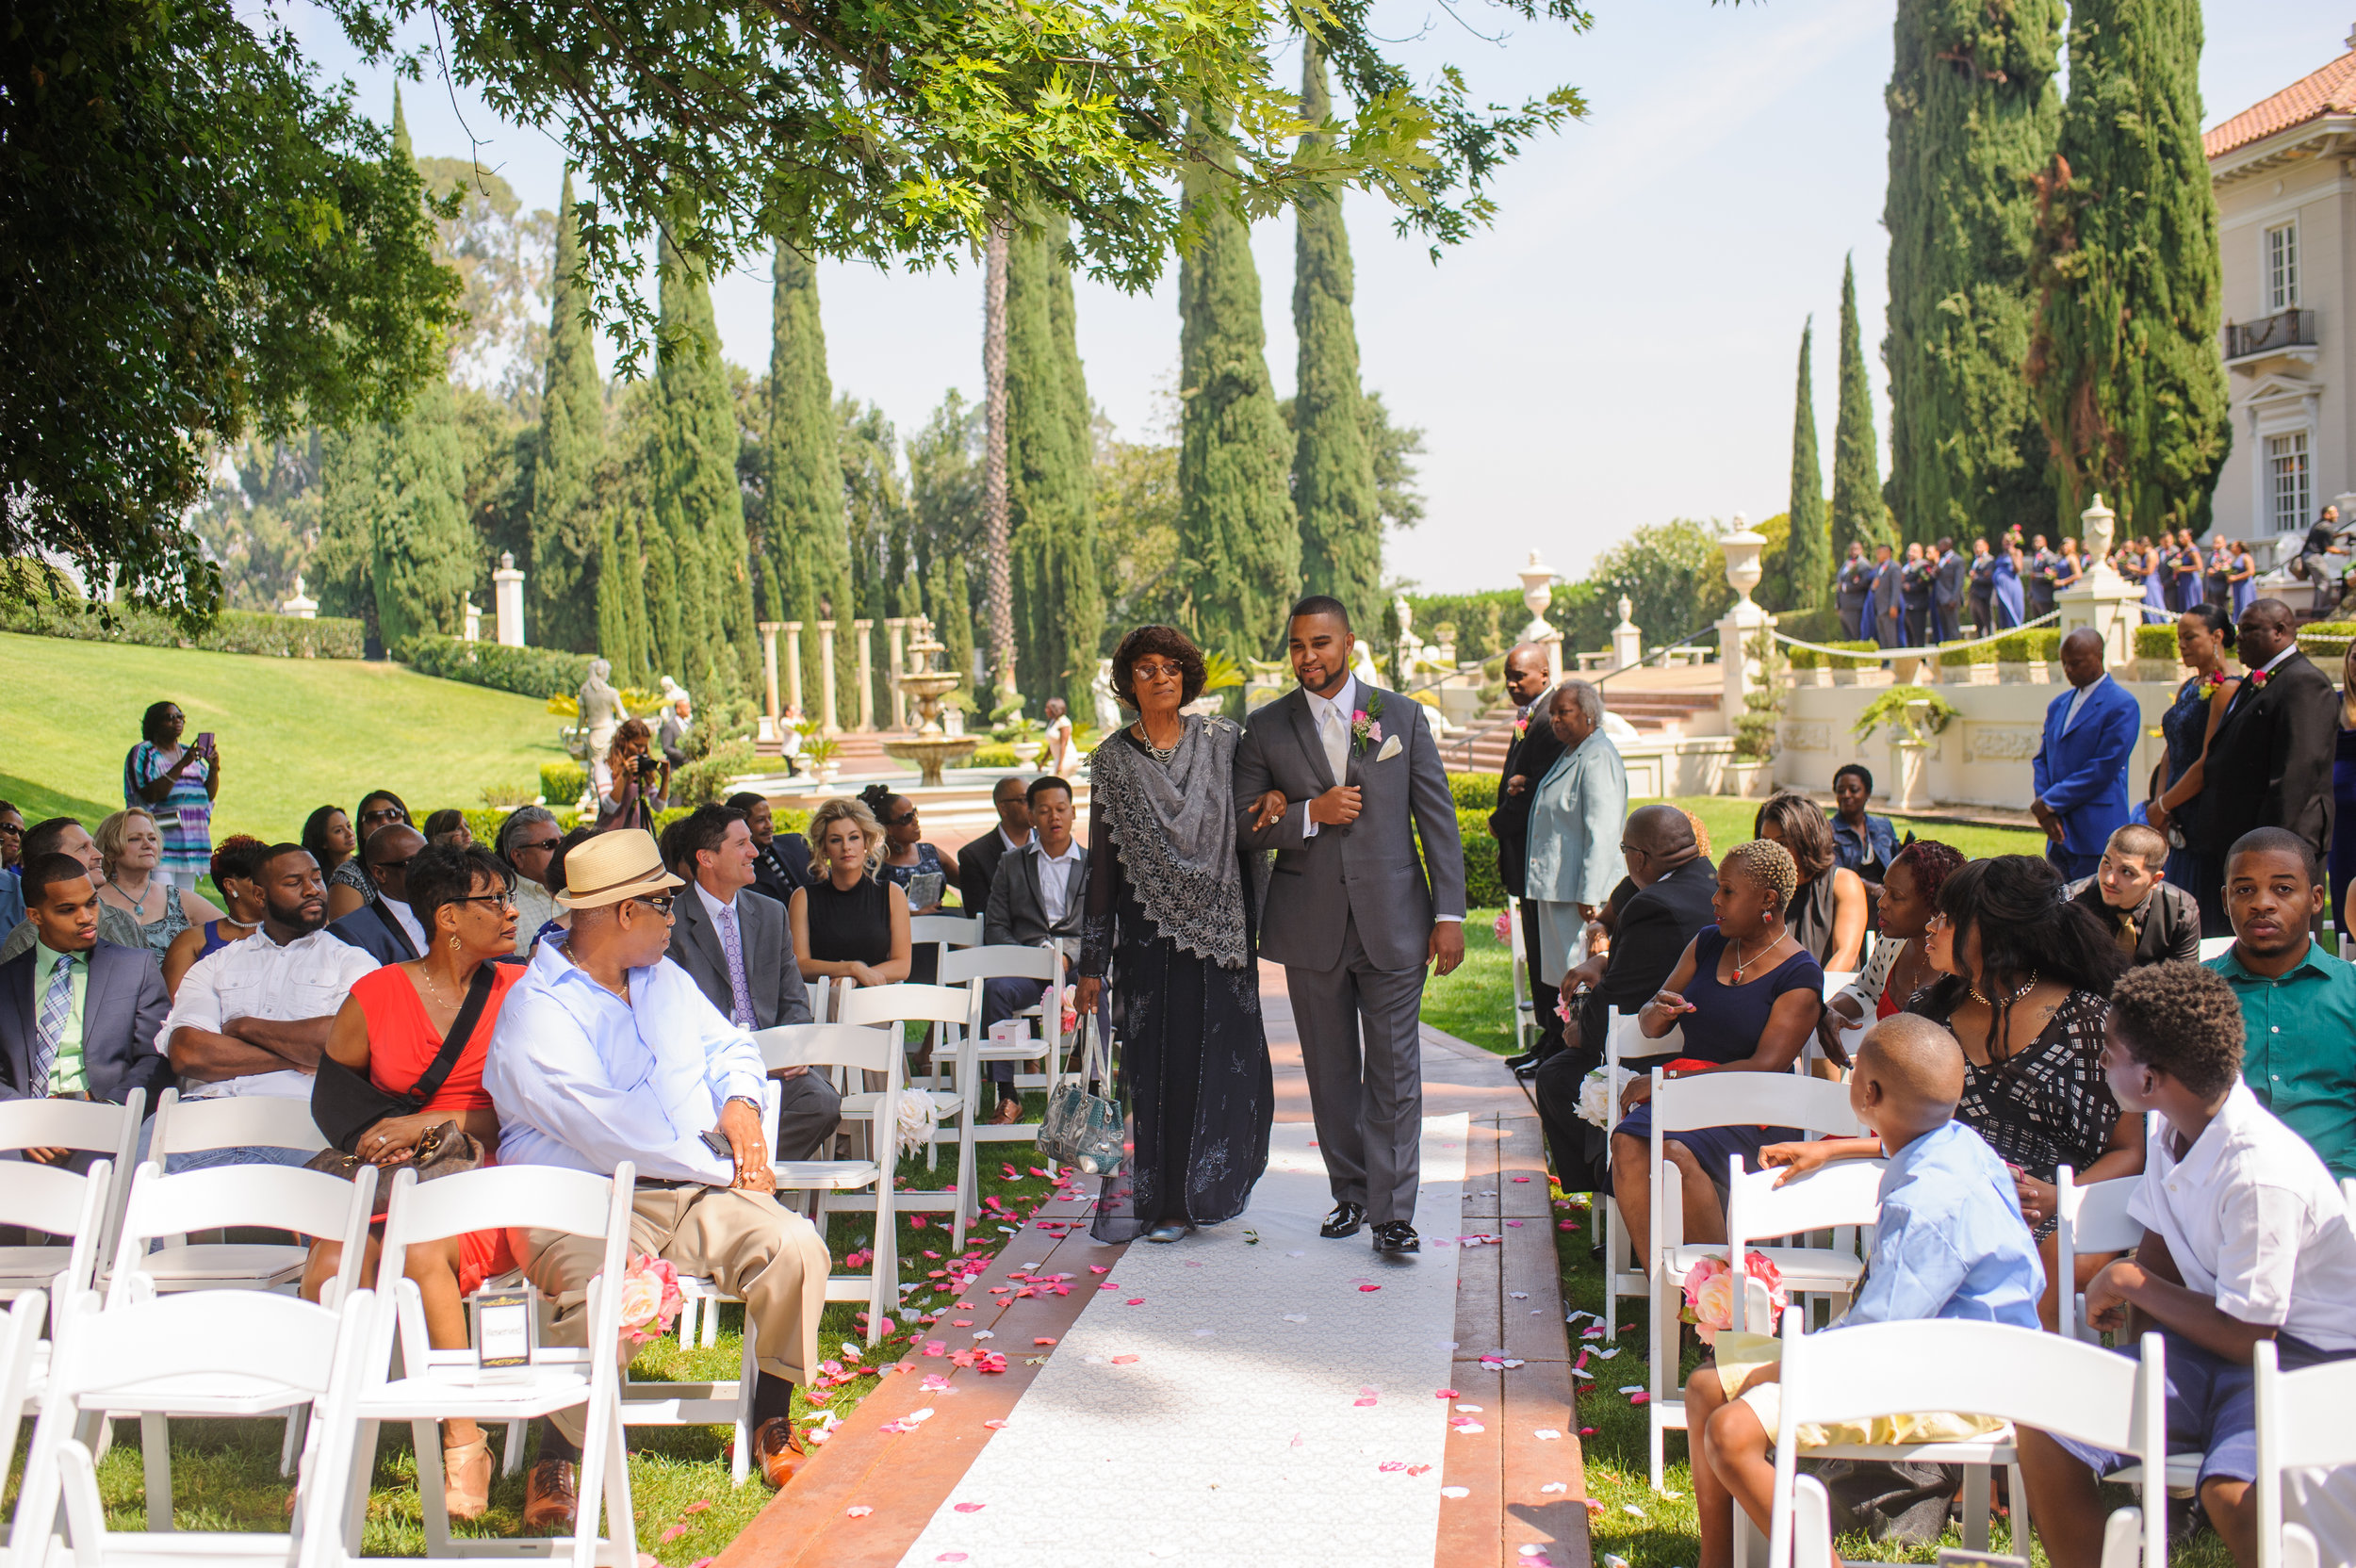 trina-cj-010-grand-island-mansion-sacramento-wedding-photographer-katherine-nicole-photography.JPG